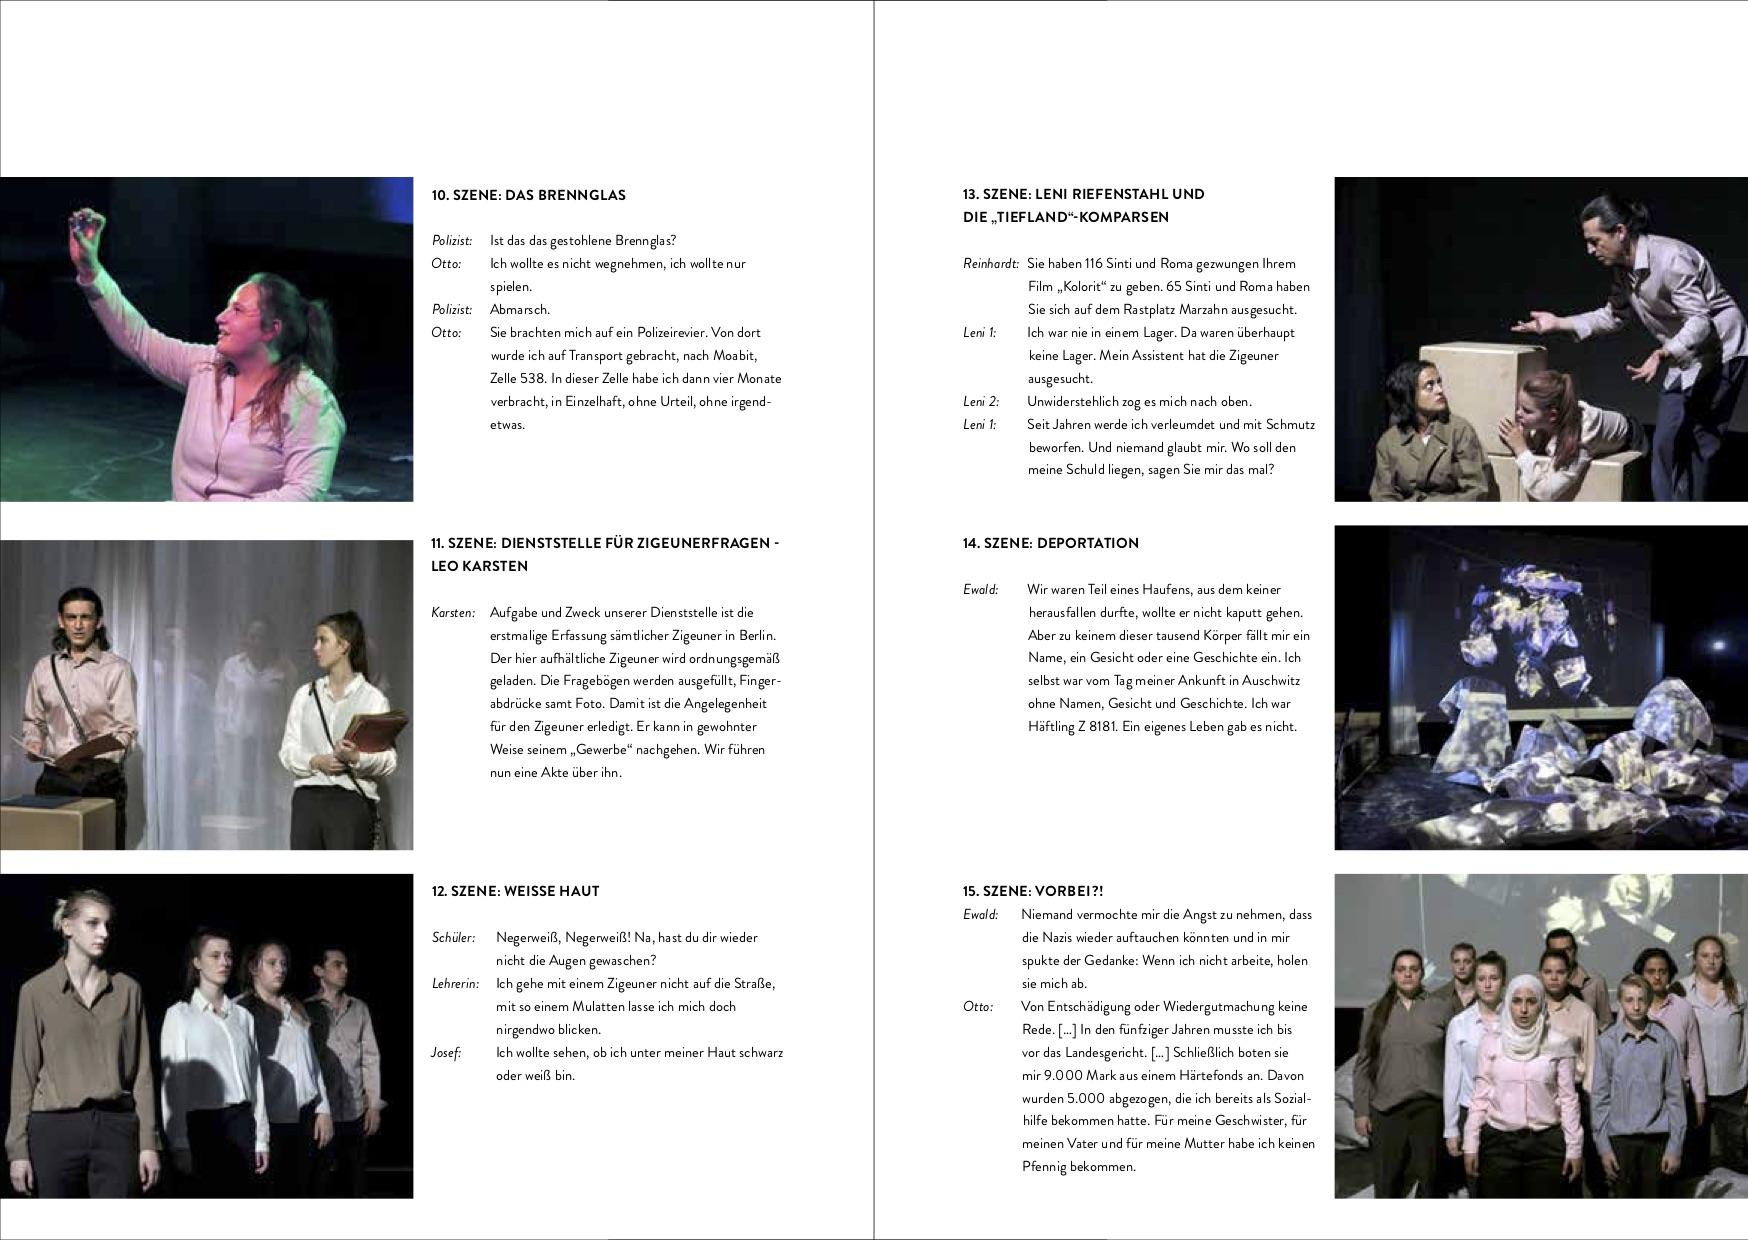 Doku-Broschüre_spreeagenten_RAM_Bro_28-Seiter_A5_03_15.12.17_S14+15.jpg